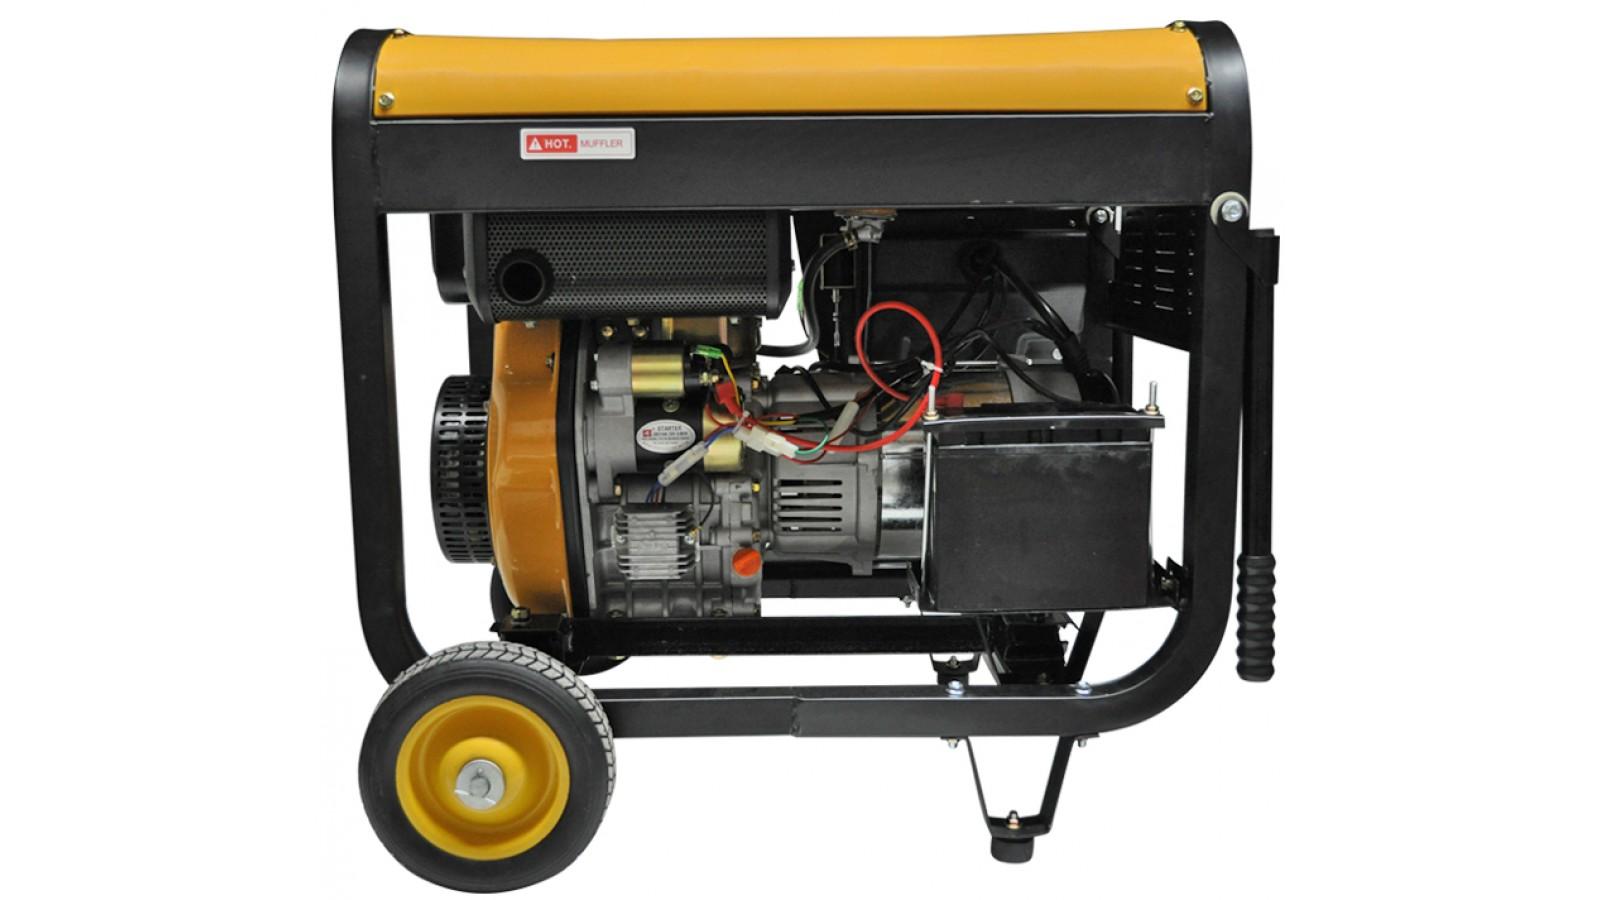 Generatore di corrente 4 5 kw diesel gruppo elettrogeno for Generatore di corrente 10 kw